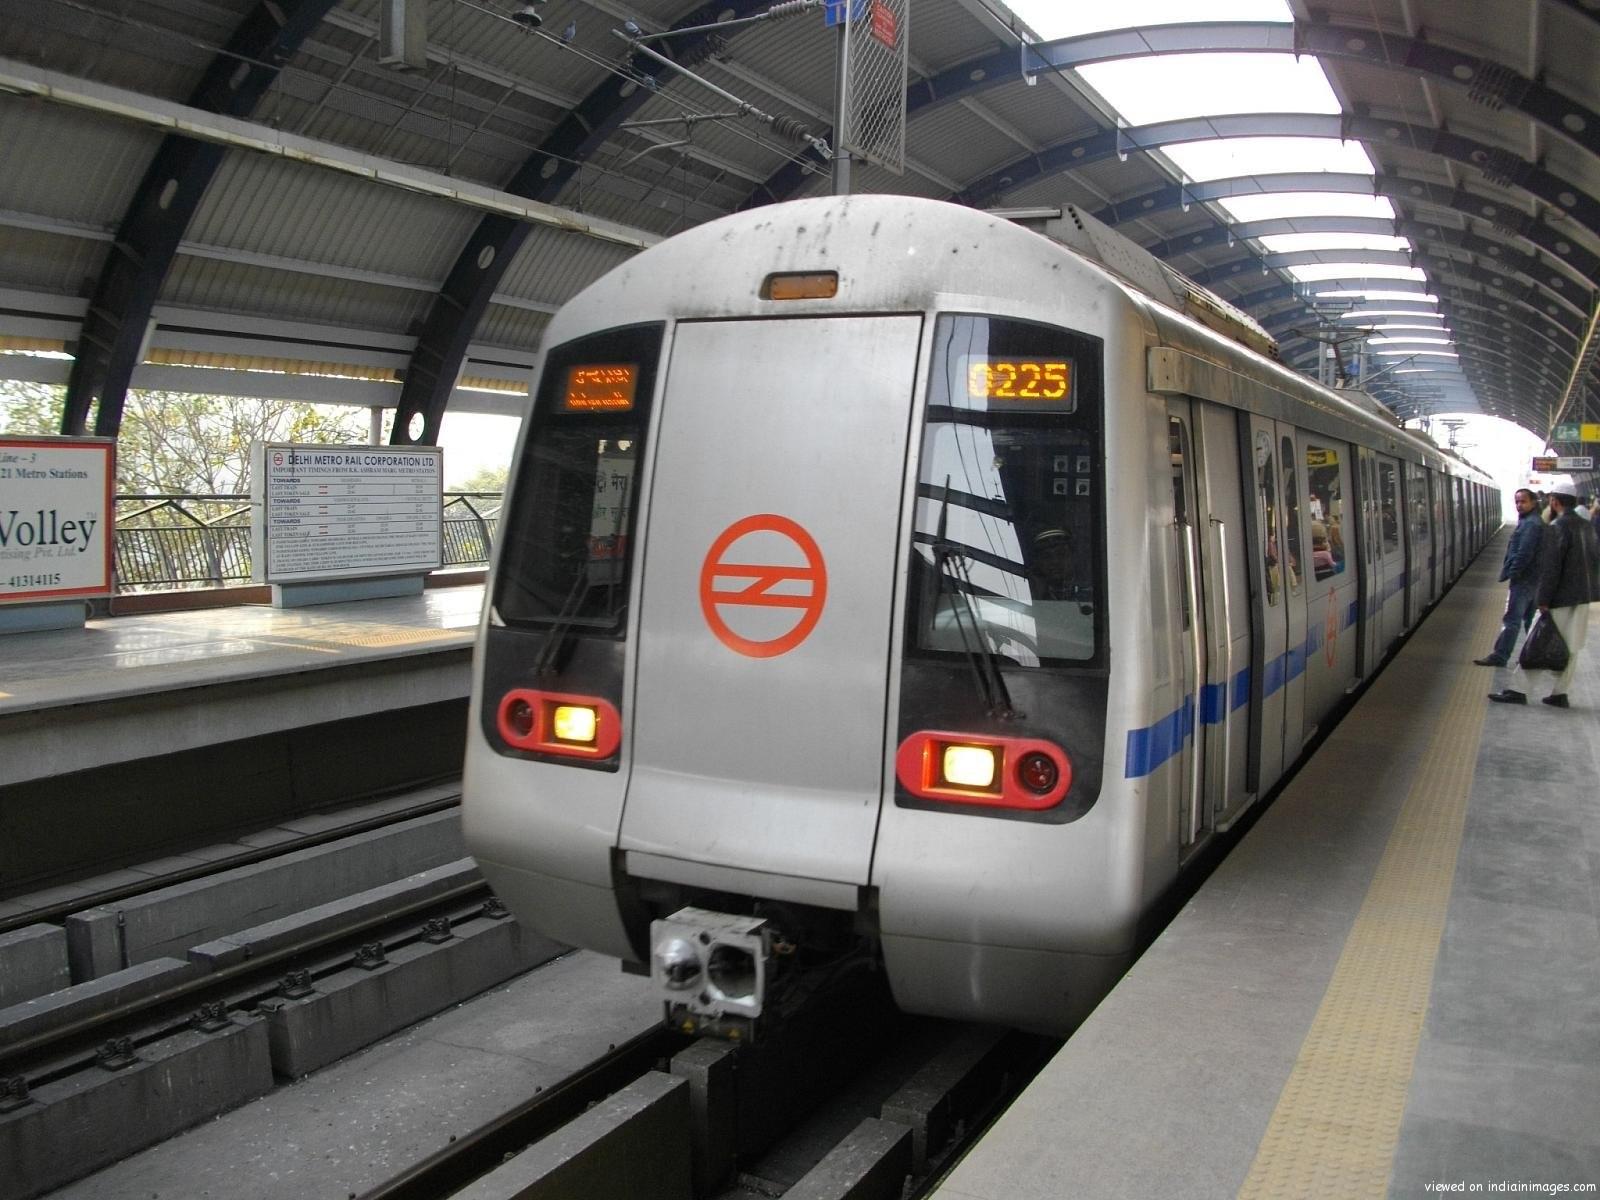 Parcel deliveries at Delhi train stations